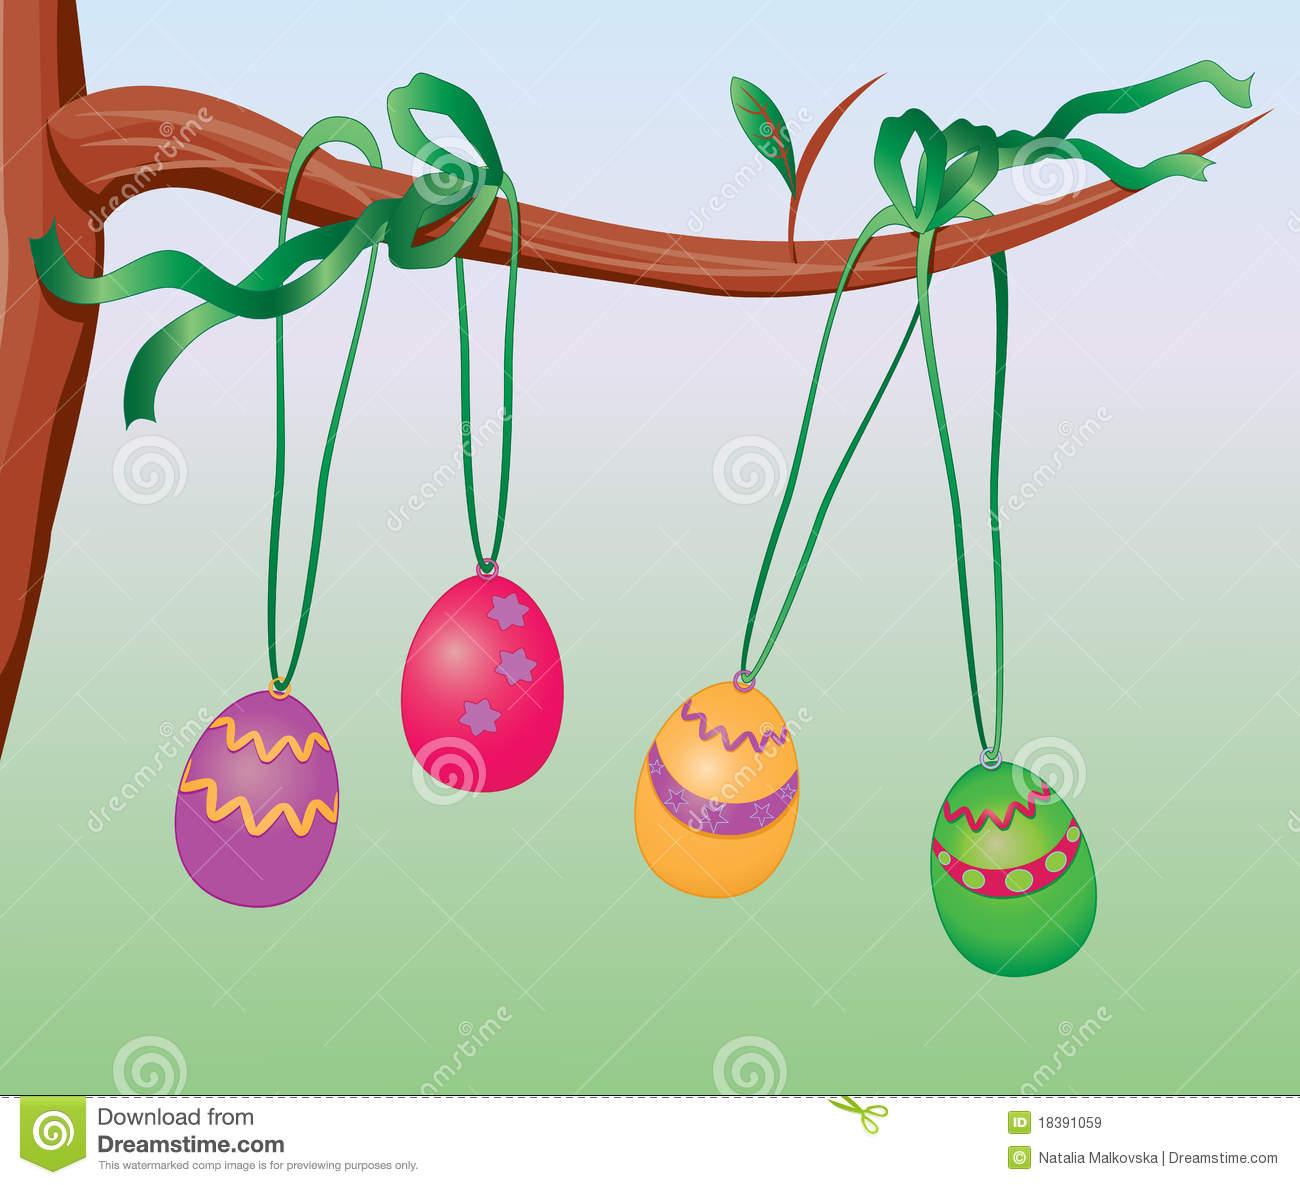 Easter egg tree clipart clip art transparent Easter egg tree clipart - ClipartFest clip art transparent